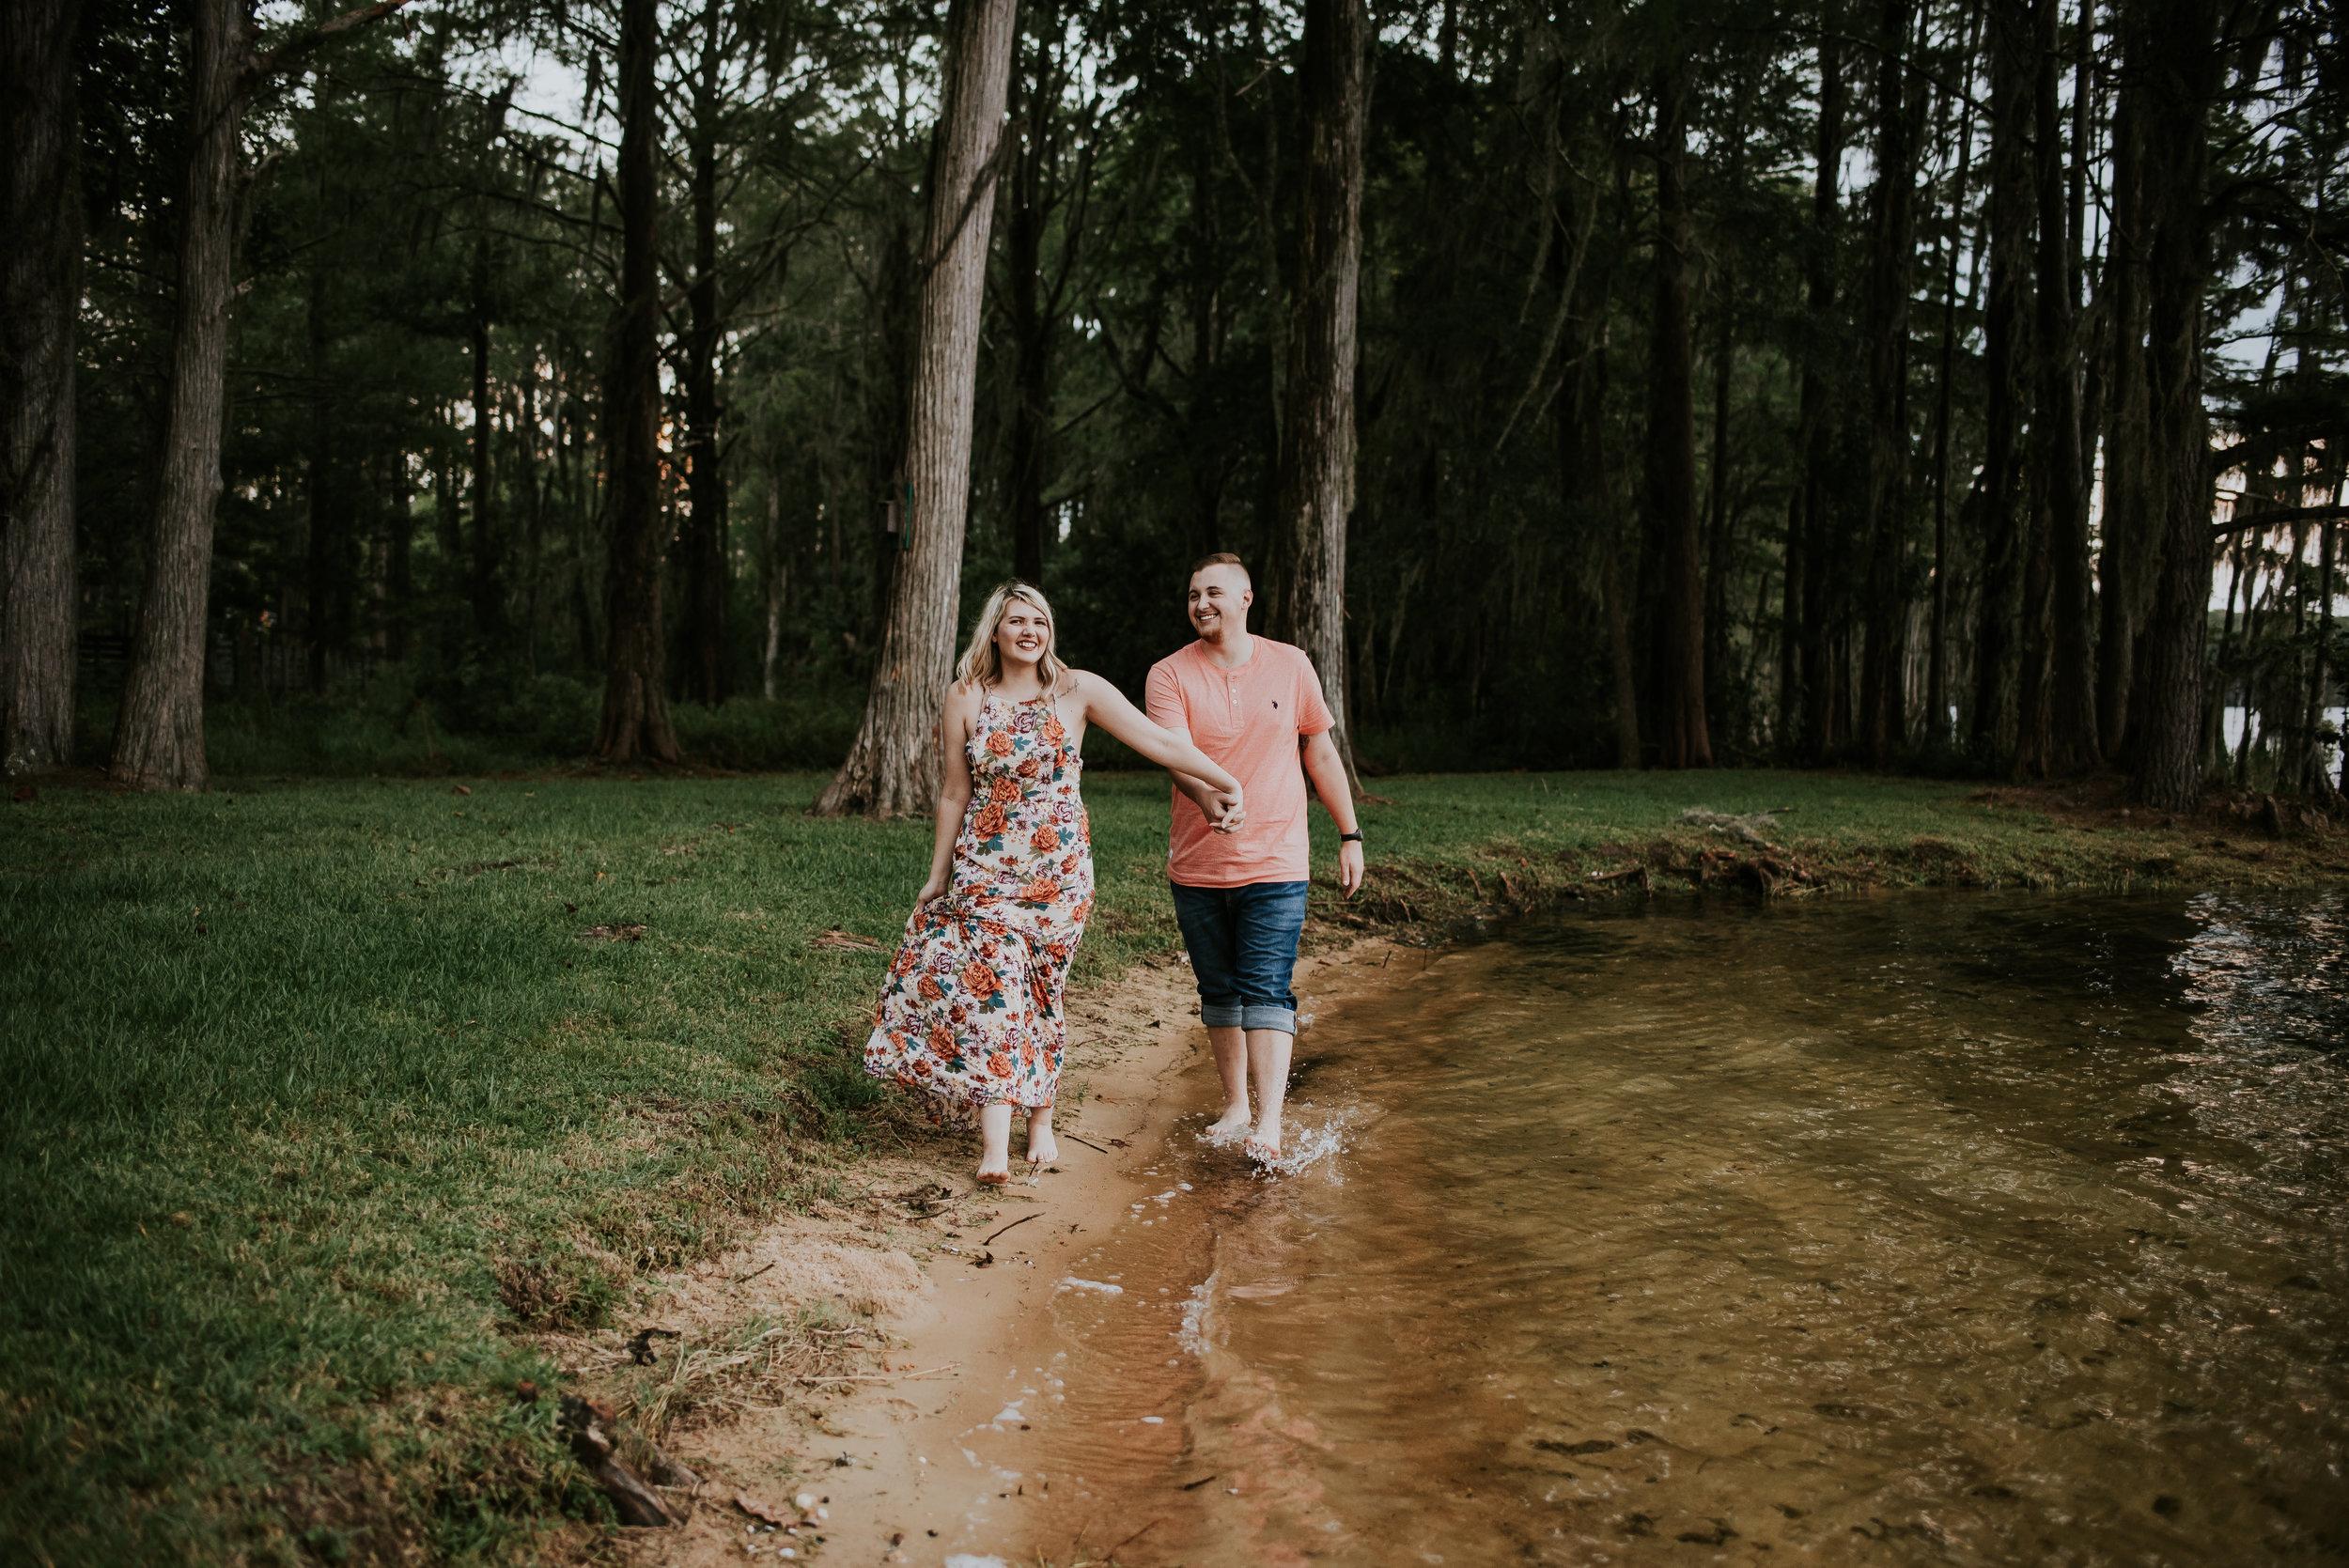 kimberly-trey-crestview-florida-couples-photographer-43.jpg